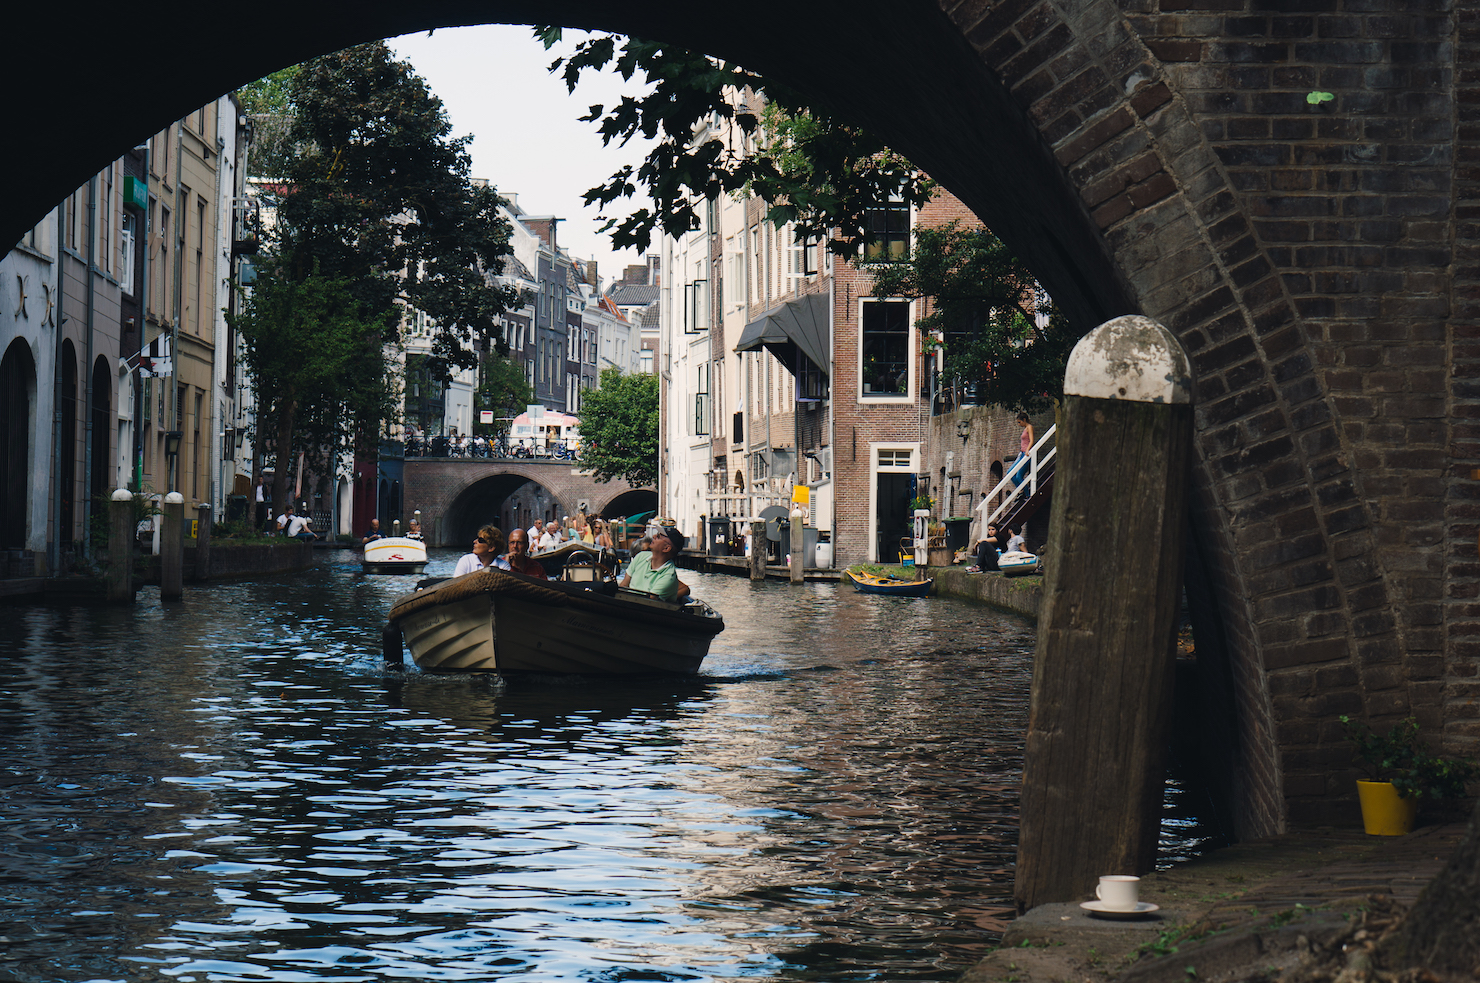 UtrechtDownUnder